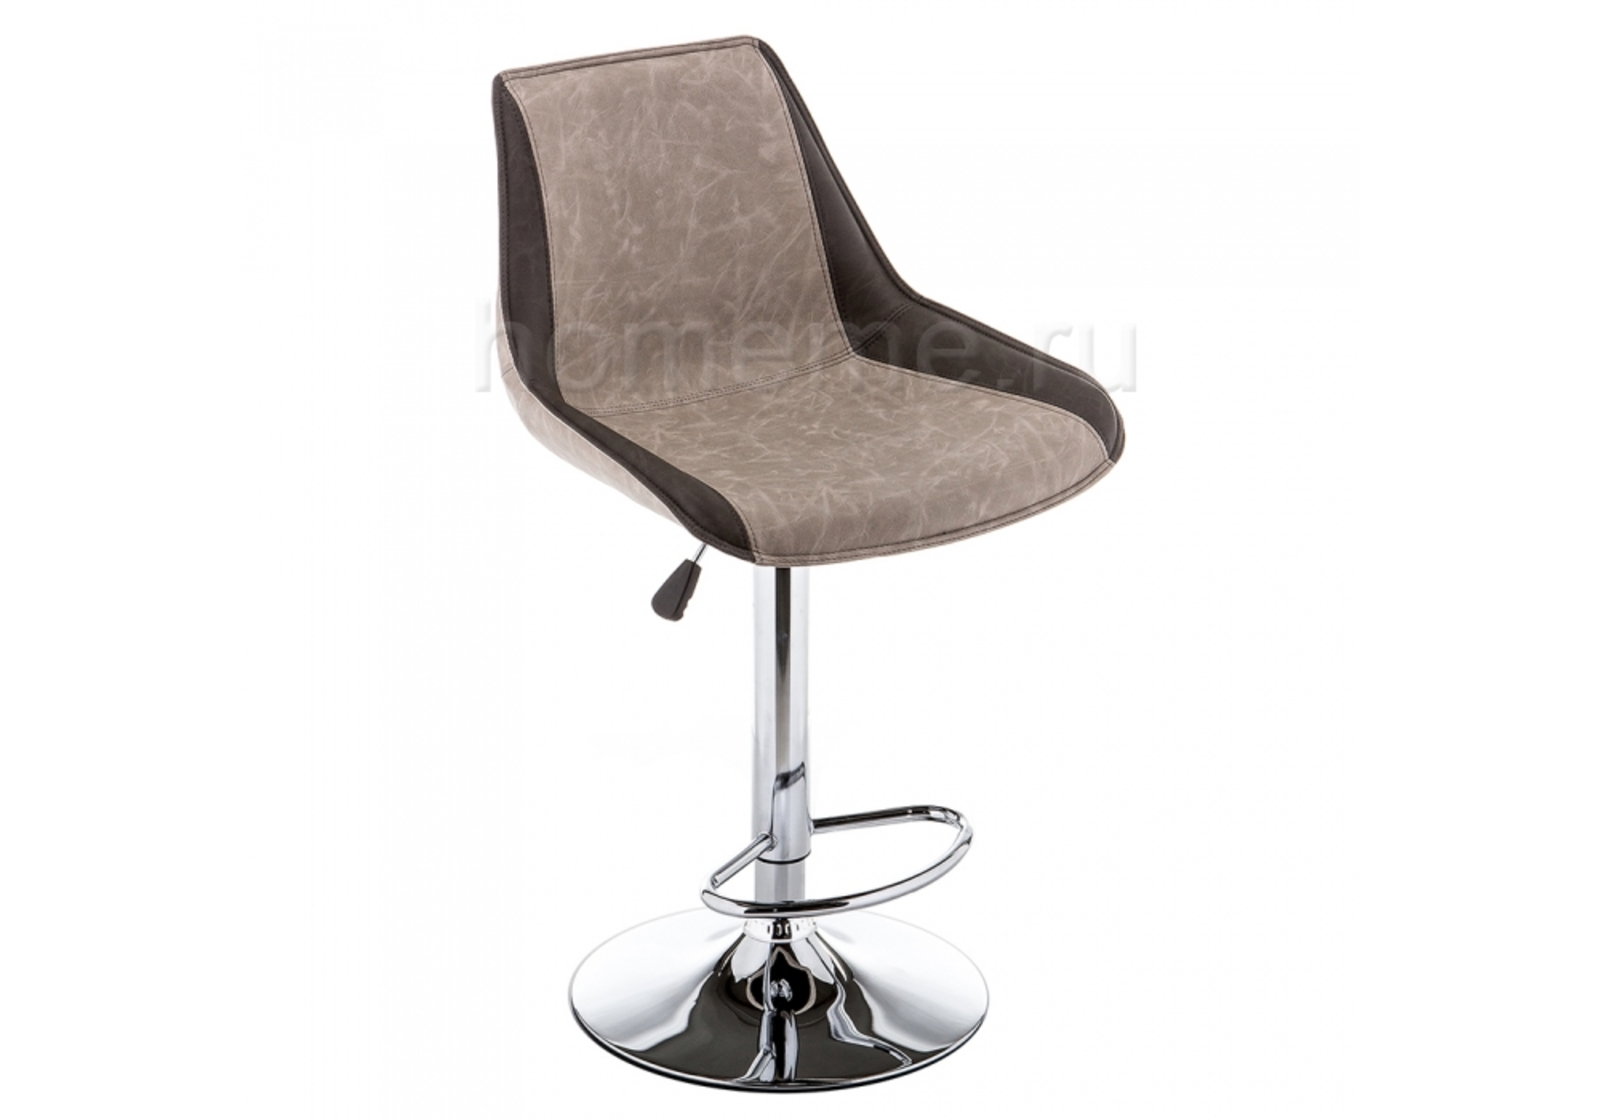 Барный стул Kozi серый 11302 Kozi серый 11302 (15696)